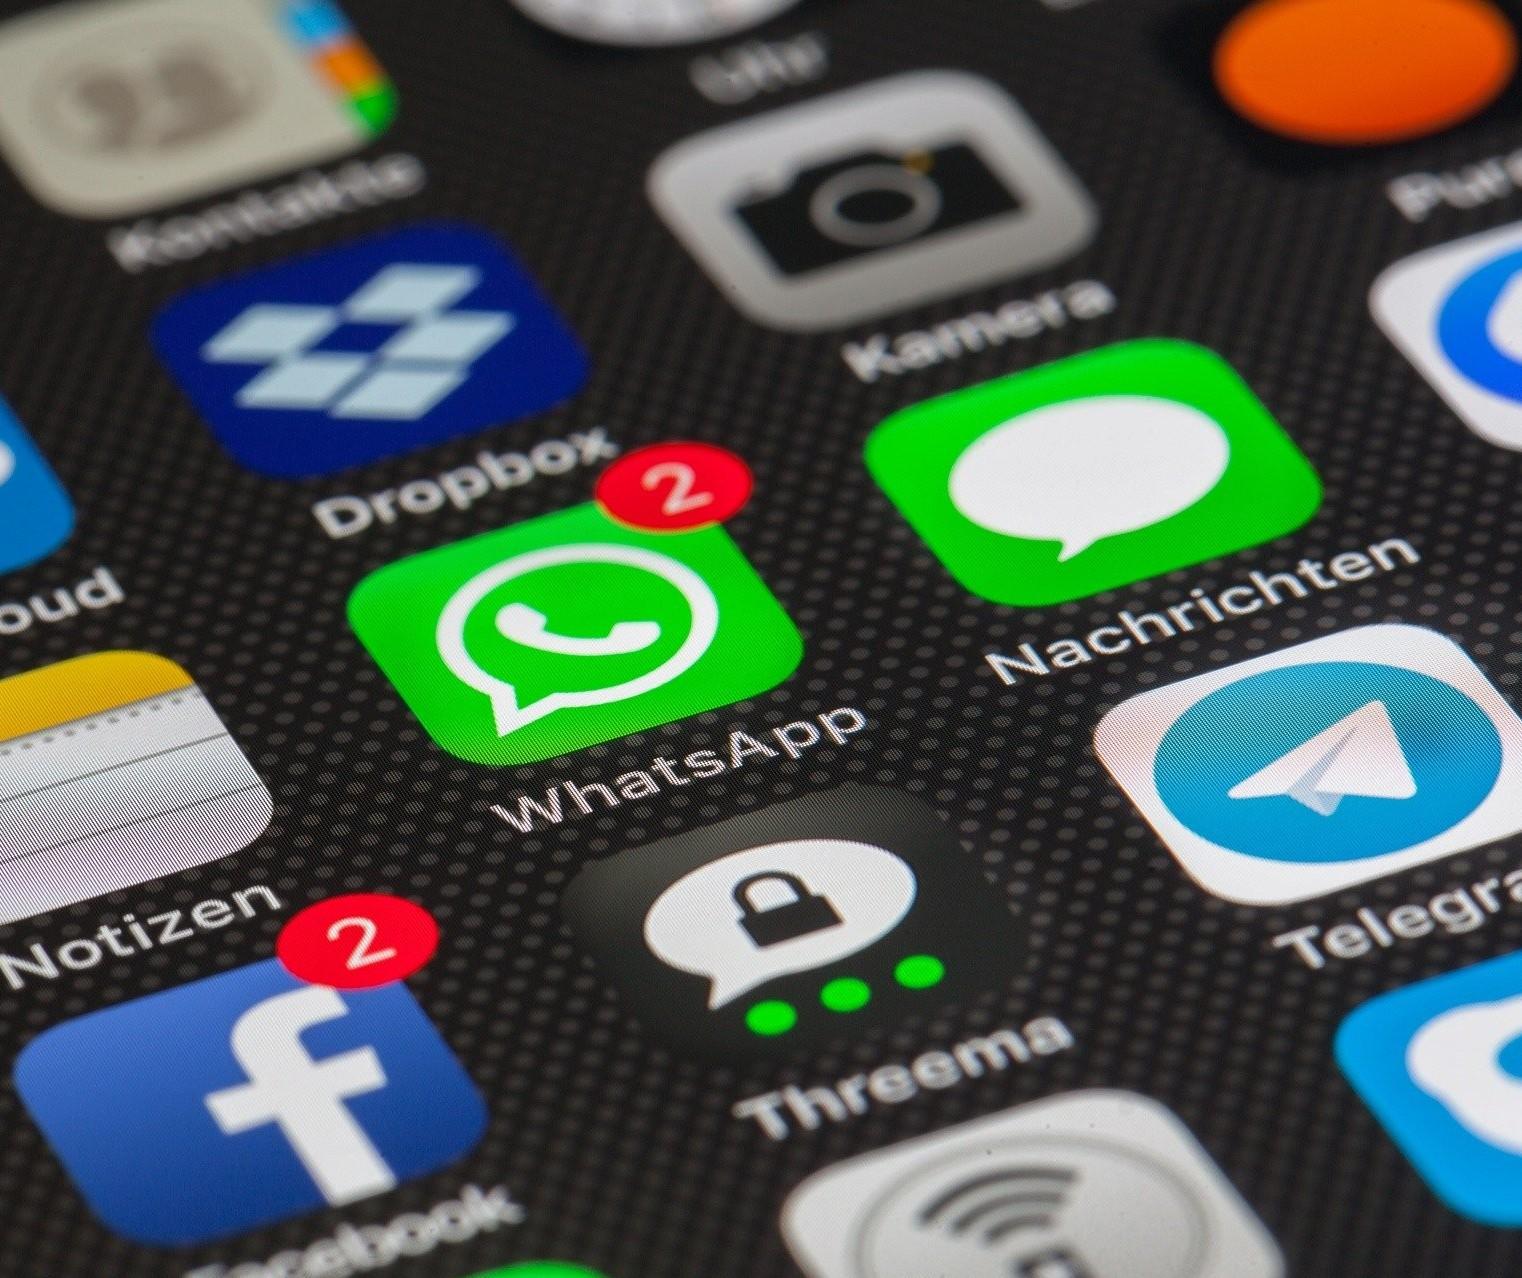 Sequestrado nas redes sociais